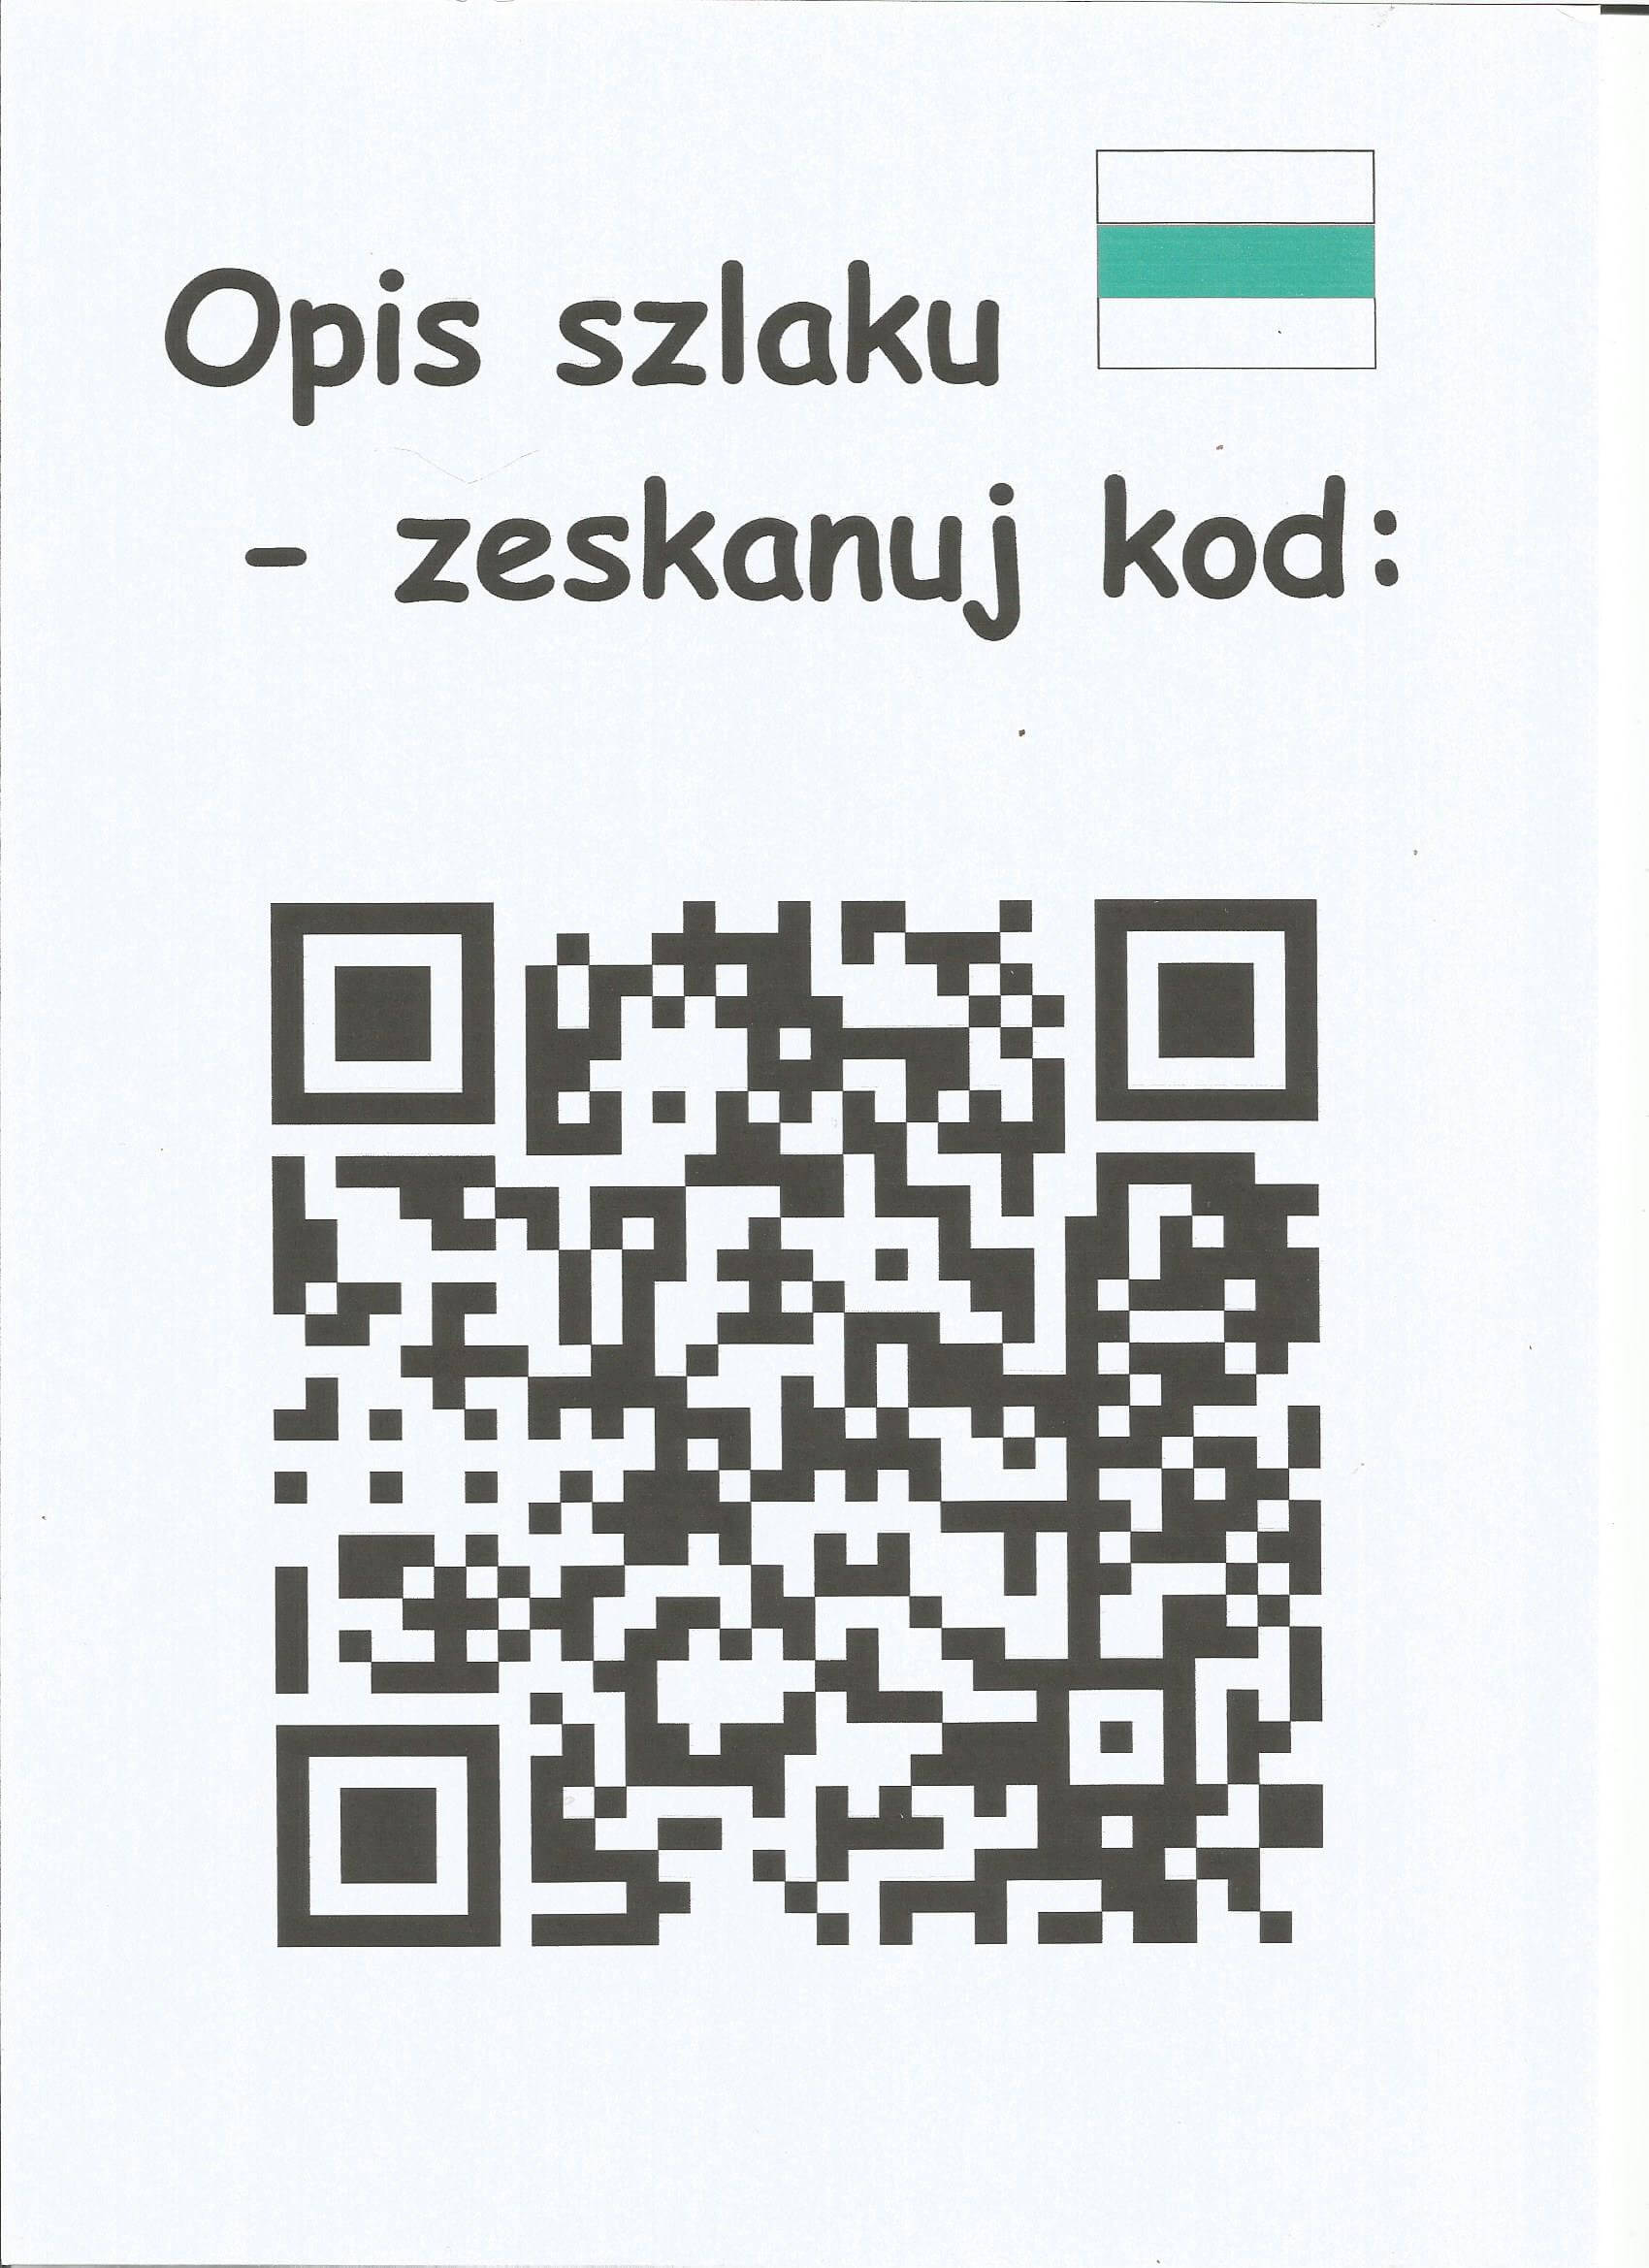 Zeskanuj kod QR poopis naszego szlaku 4